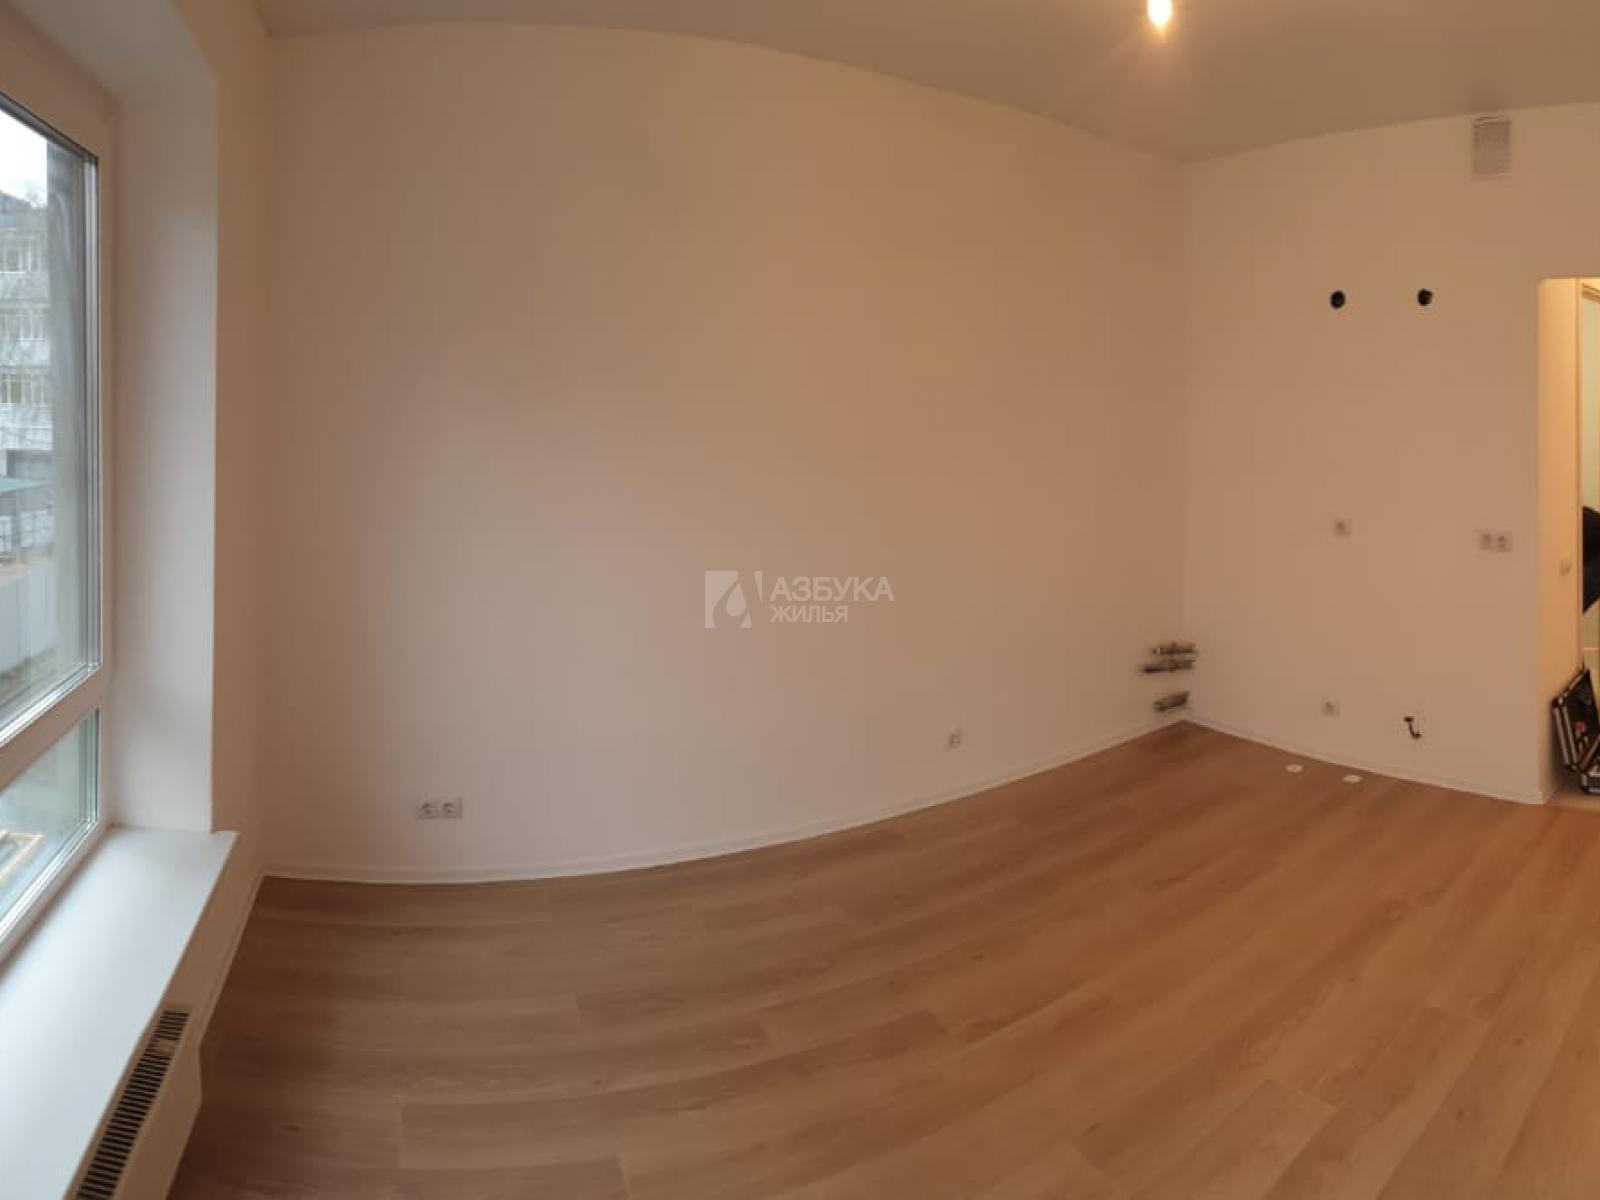 Фото №1 - 1-комнатная квартира, Люберцы, лётчика Ларюшина улица 12, метро Котельники